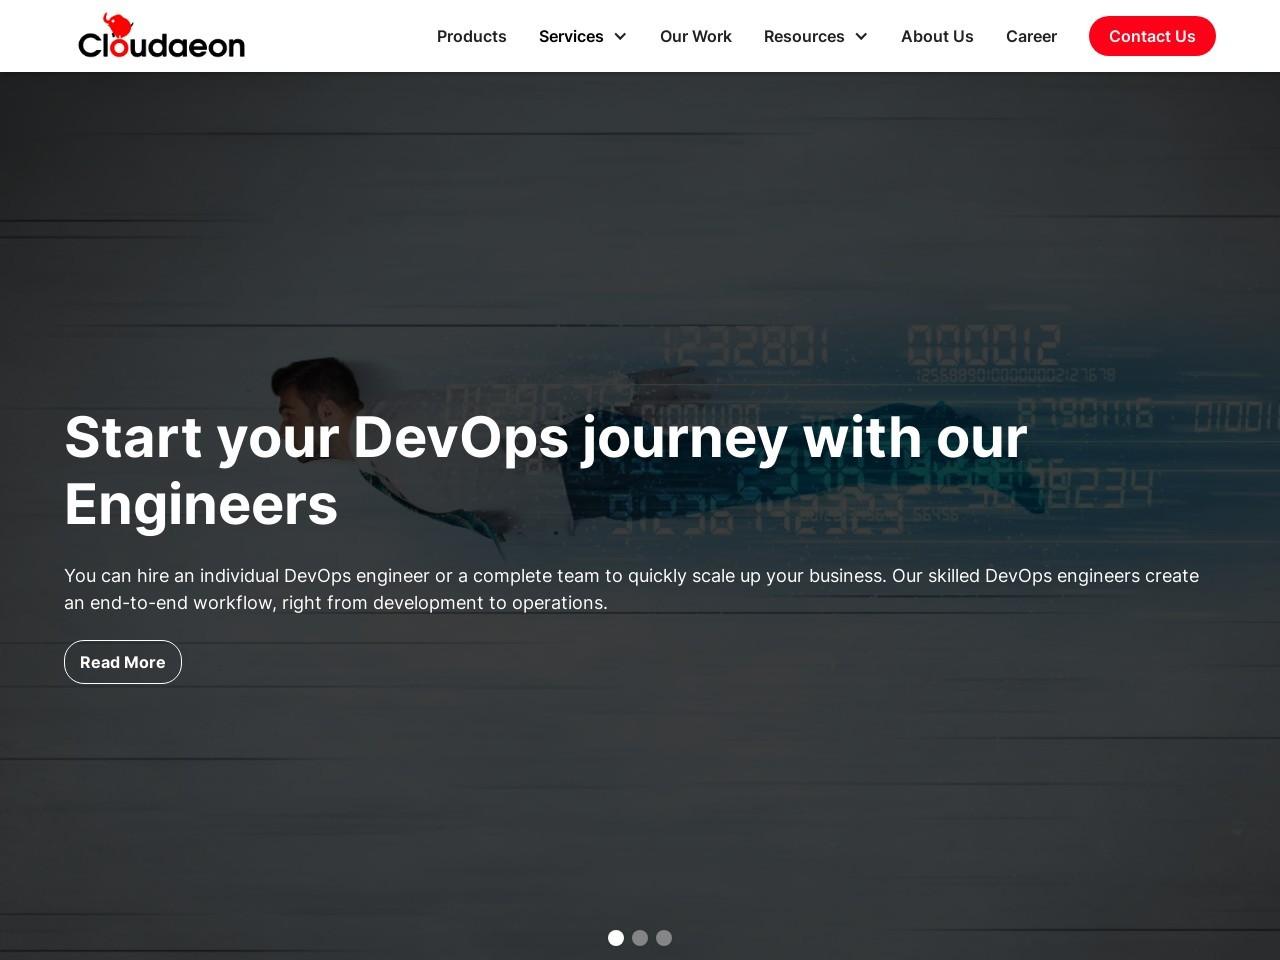 Cloudaeon Data Quality Assurance Platform includes data quality metrics and problem identification a